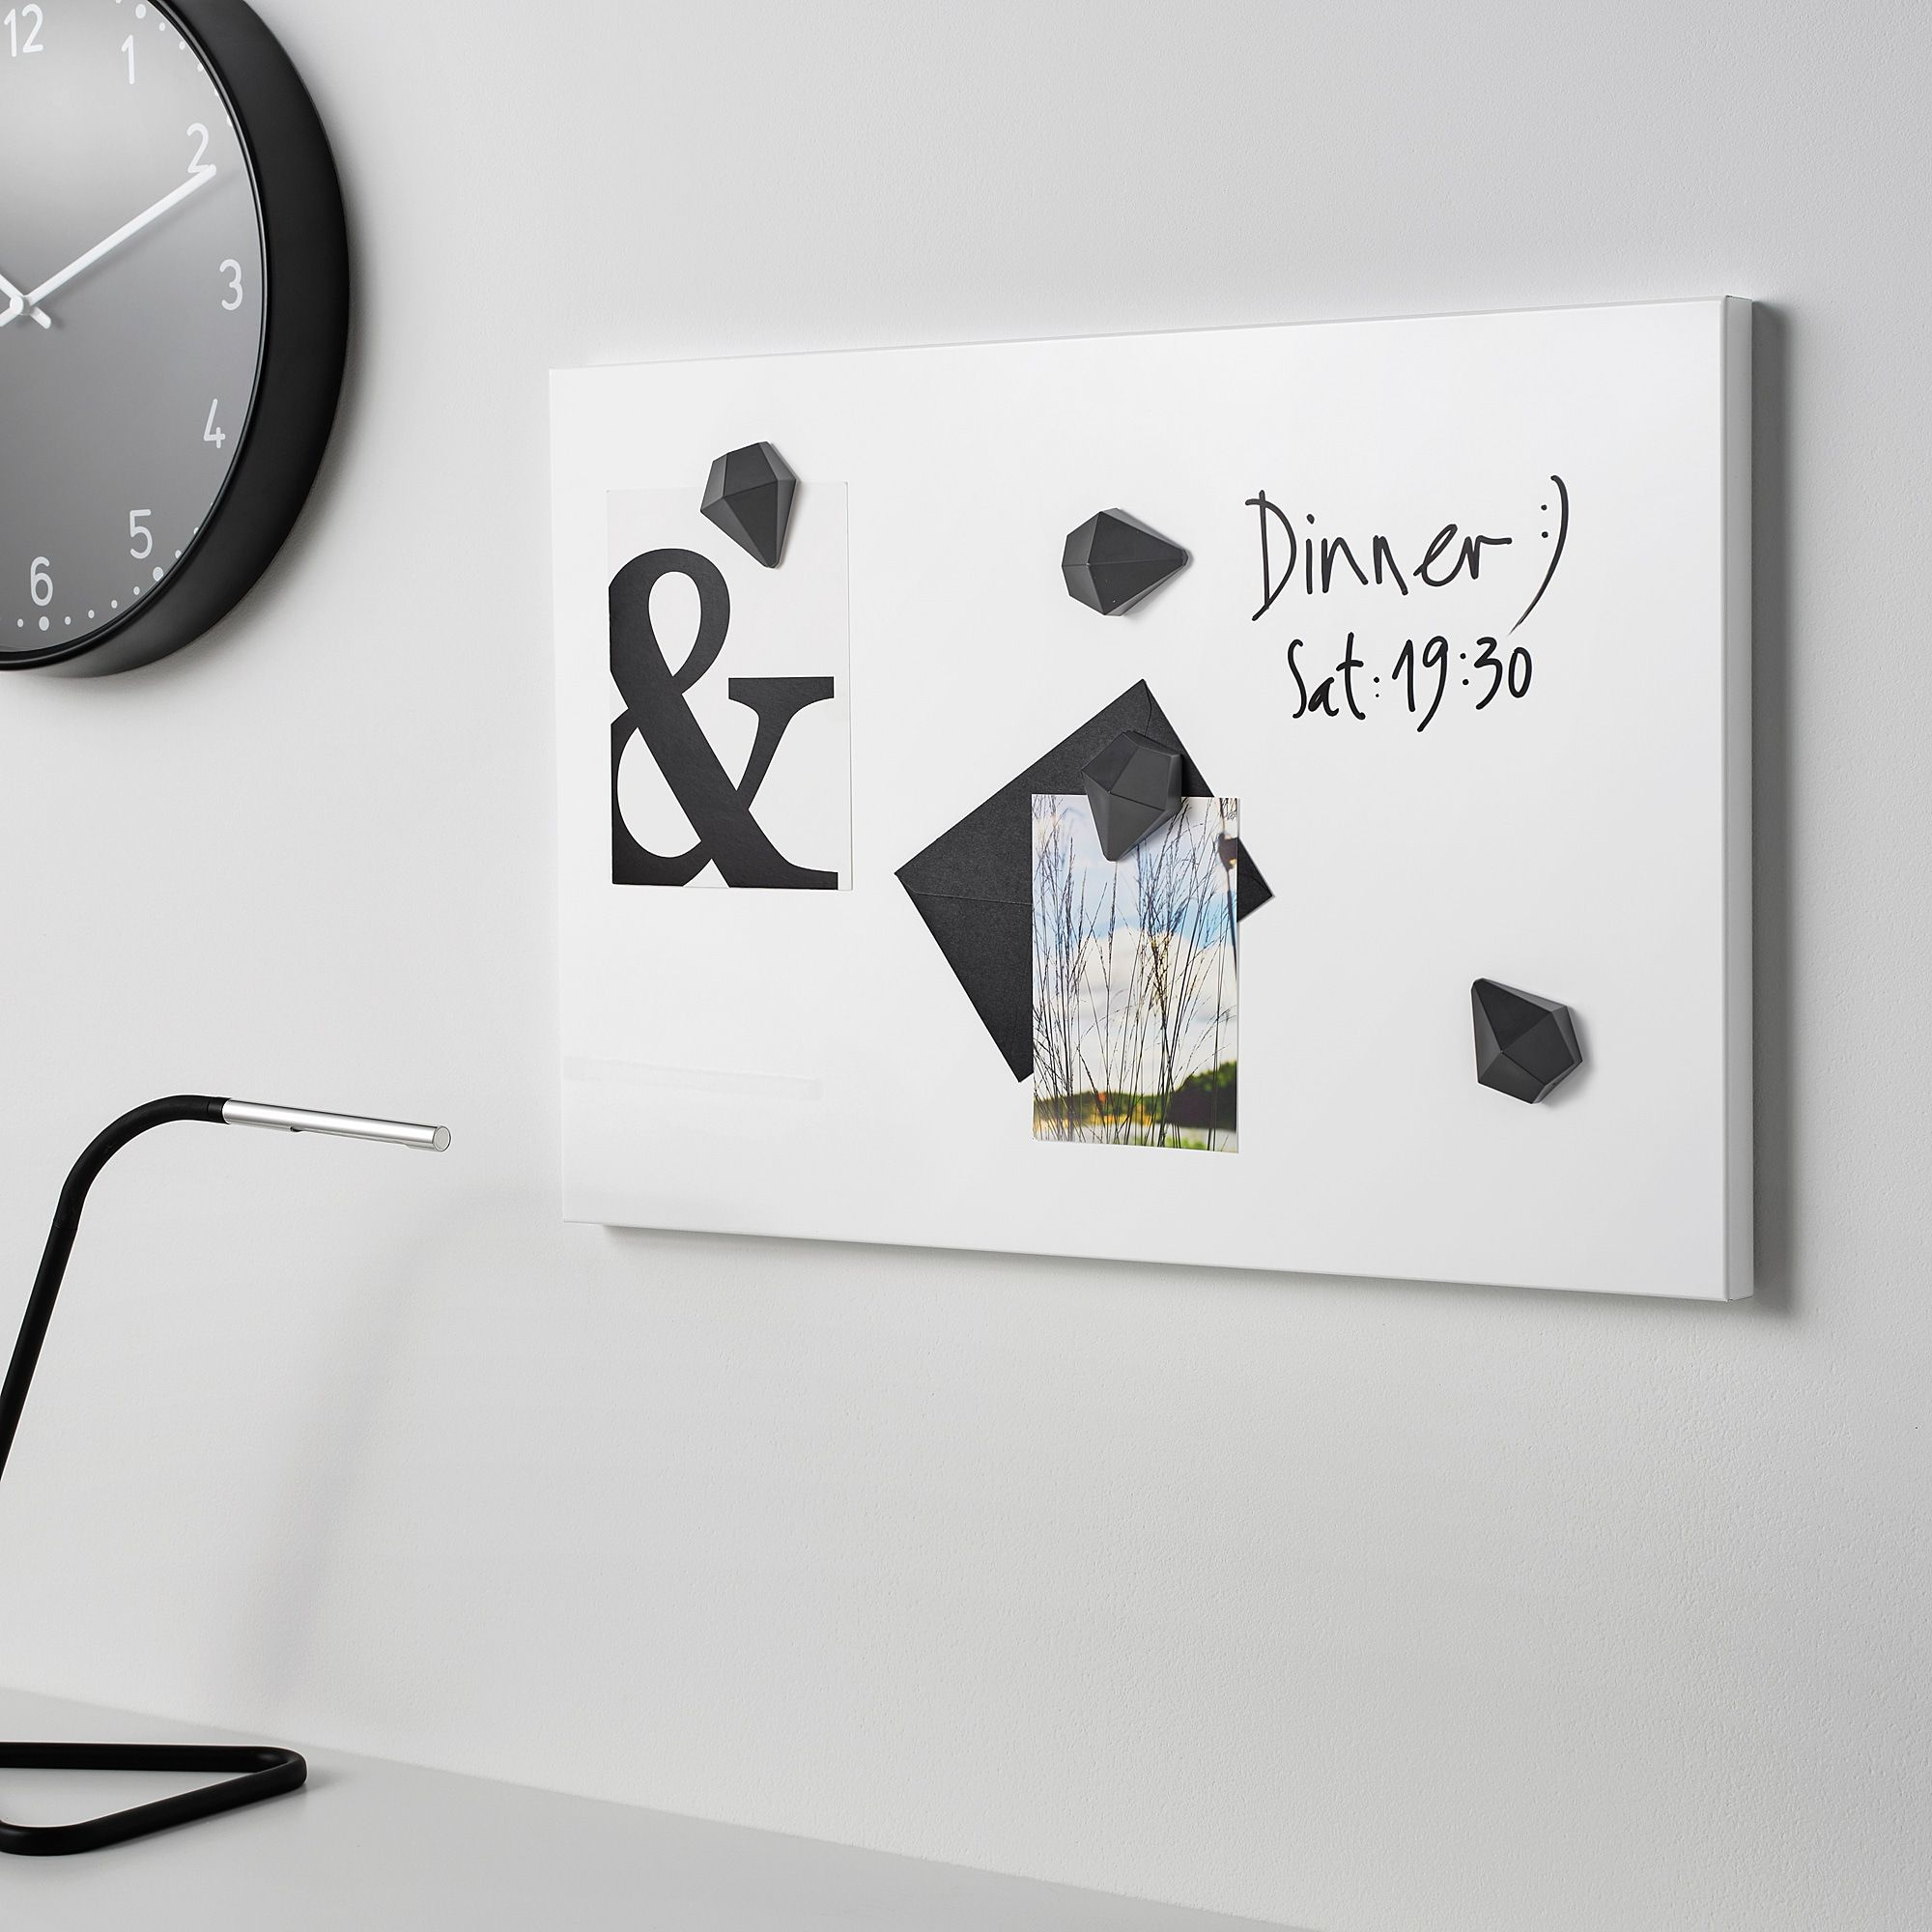 Svensas White Memo Board Ikea En 2020 Tableau Memo Tableau Affichage Tableau Blanc Magnetique